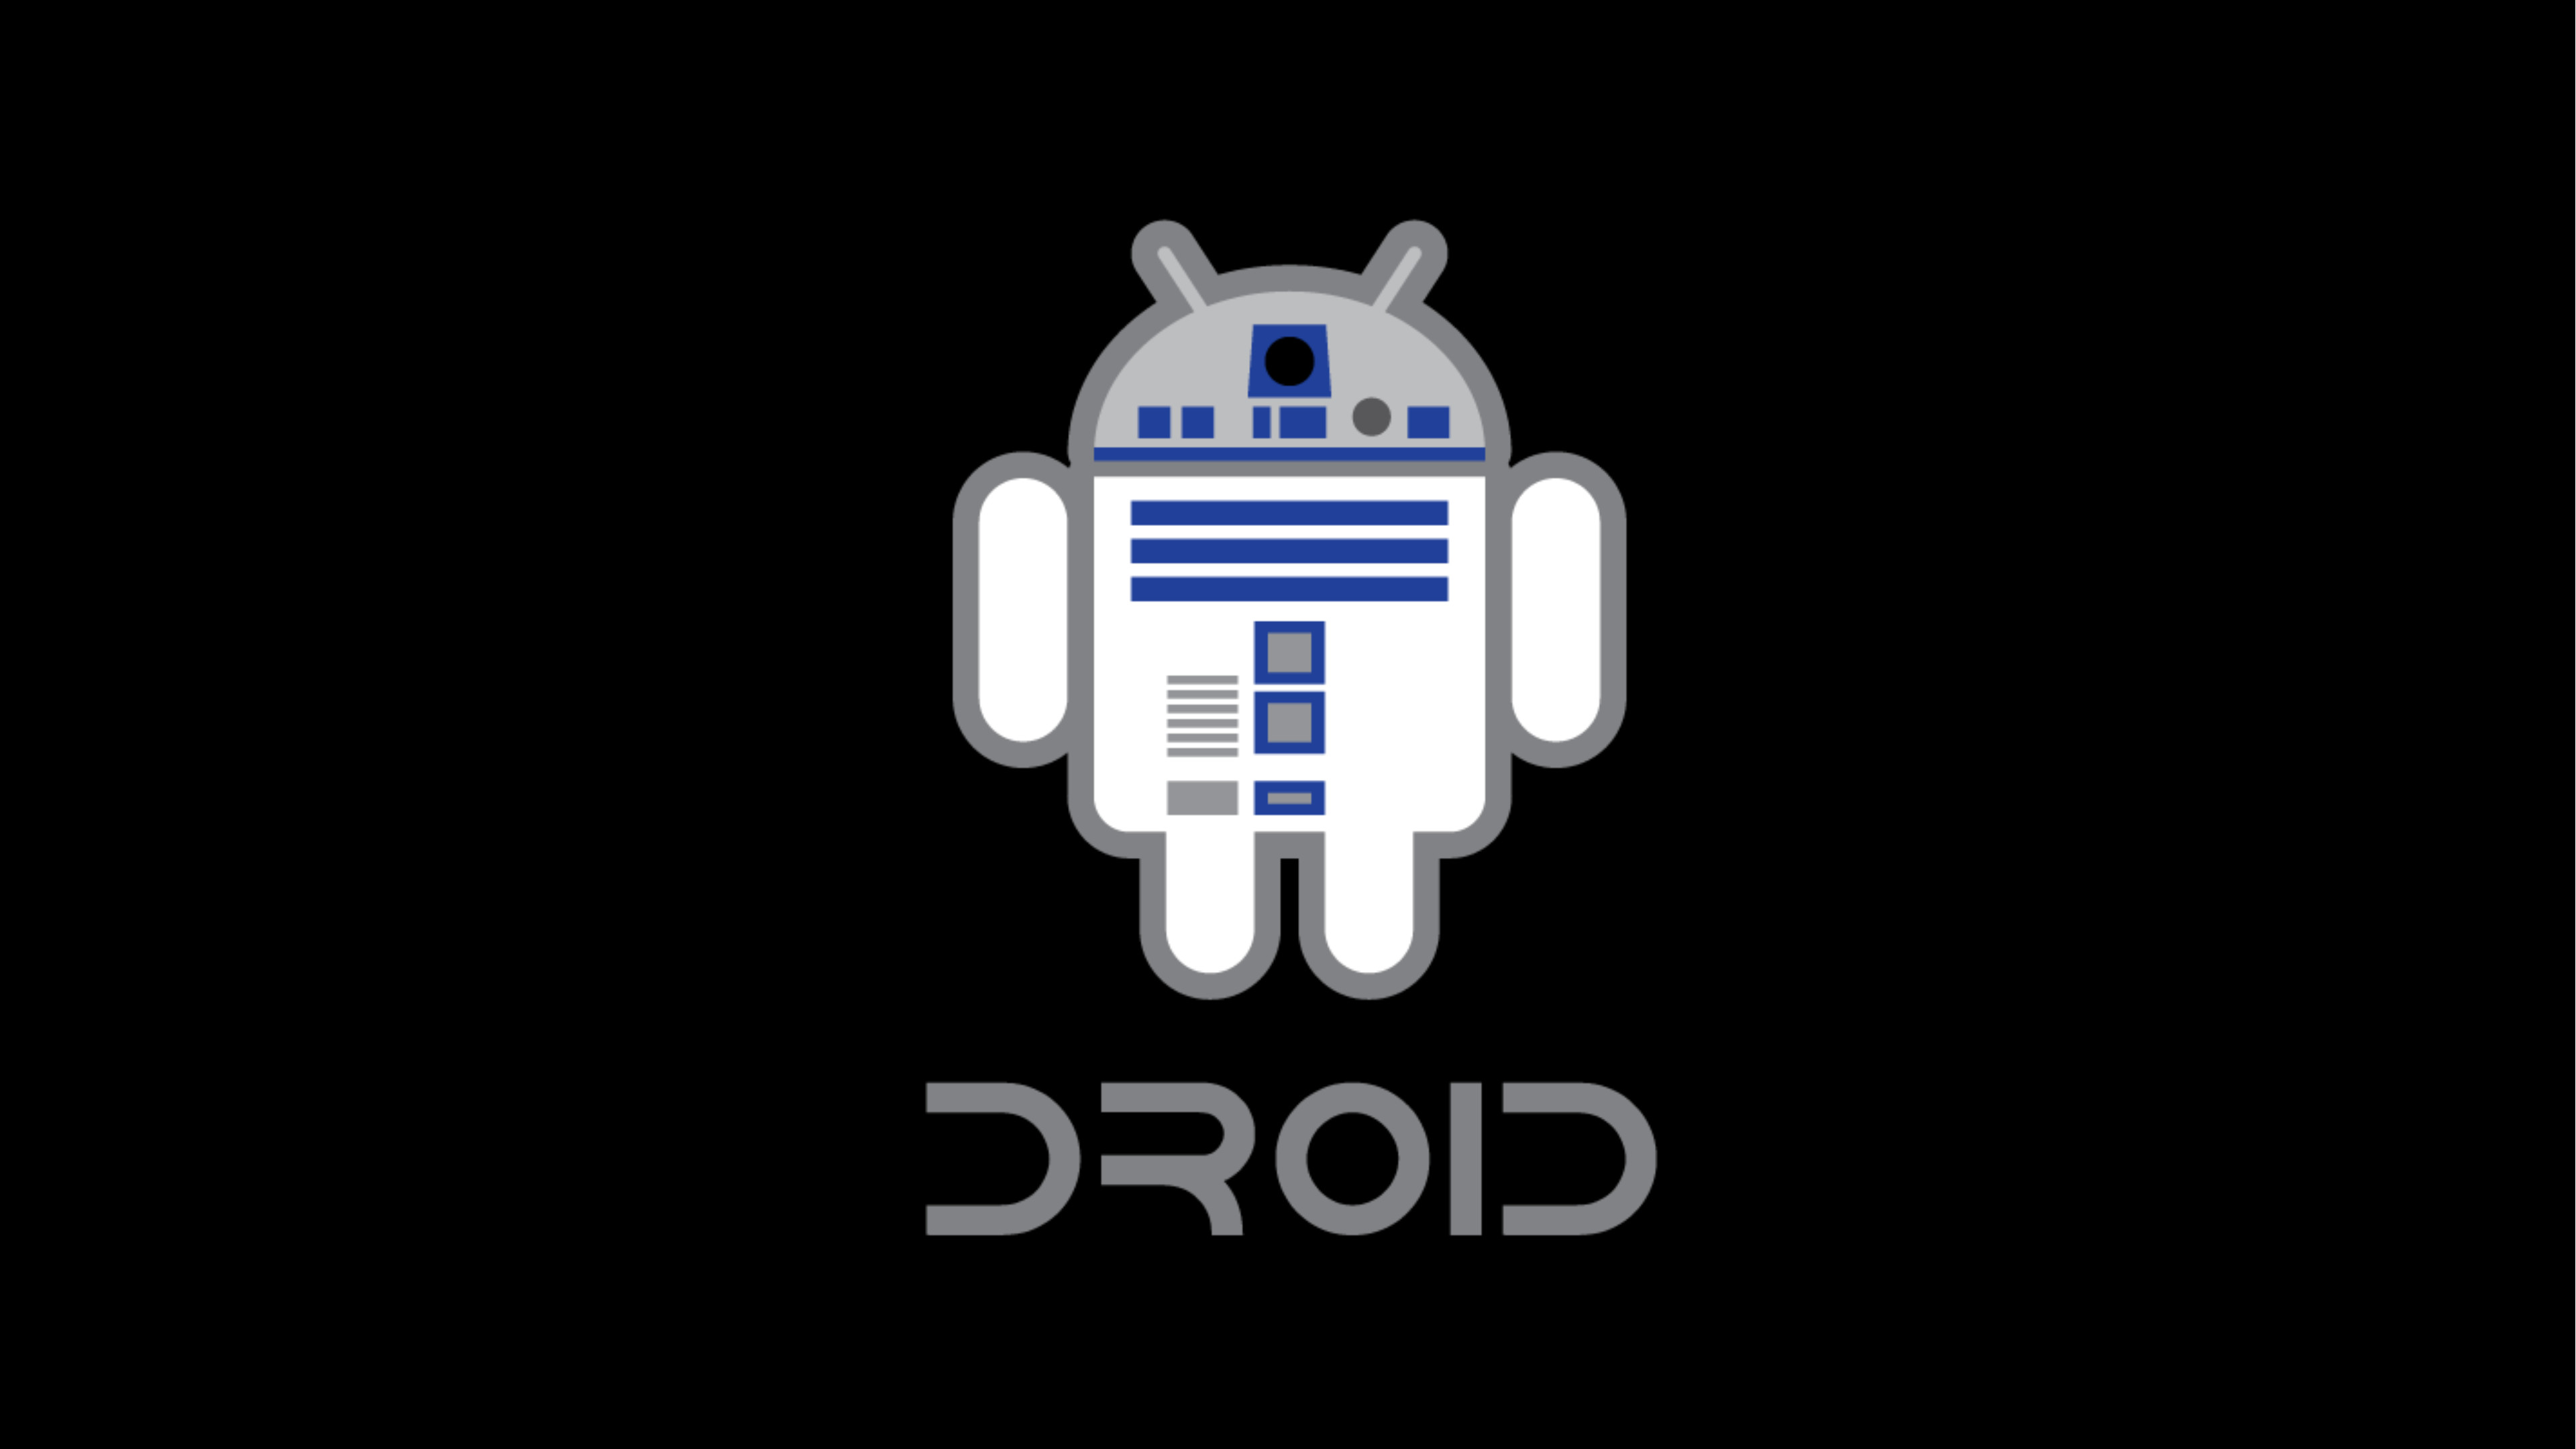 … best star wars logo wallpaper phone pictures …